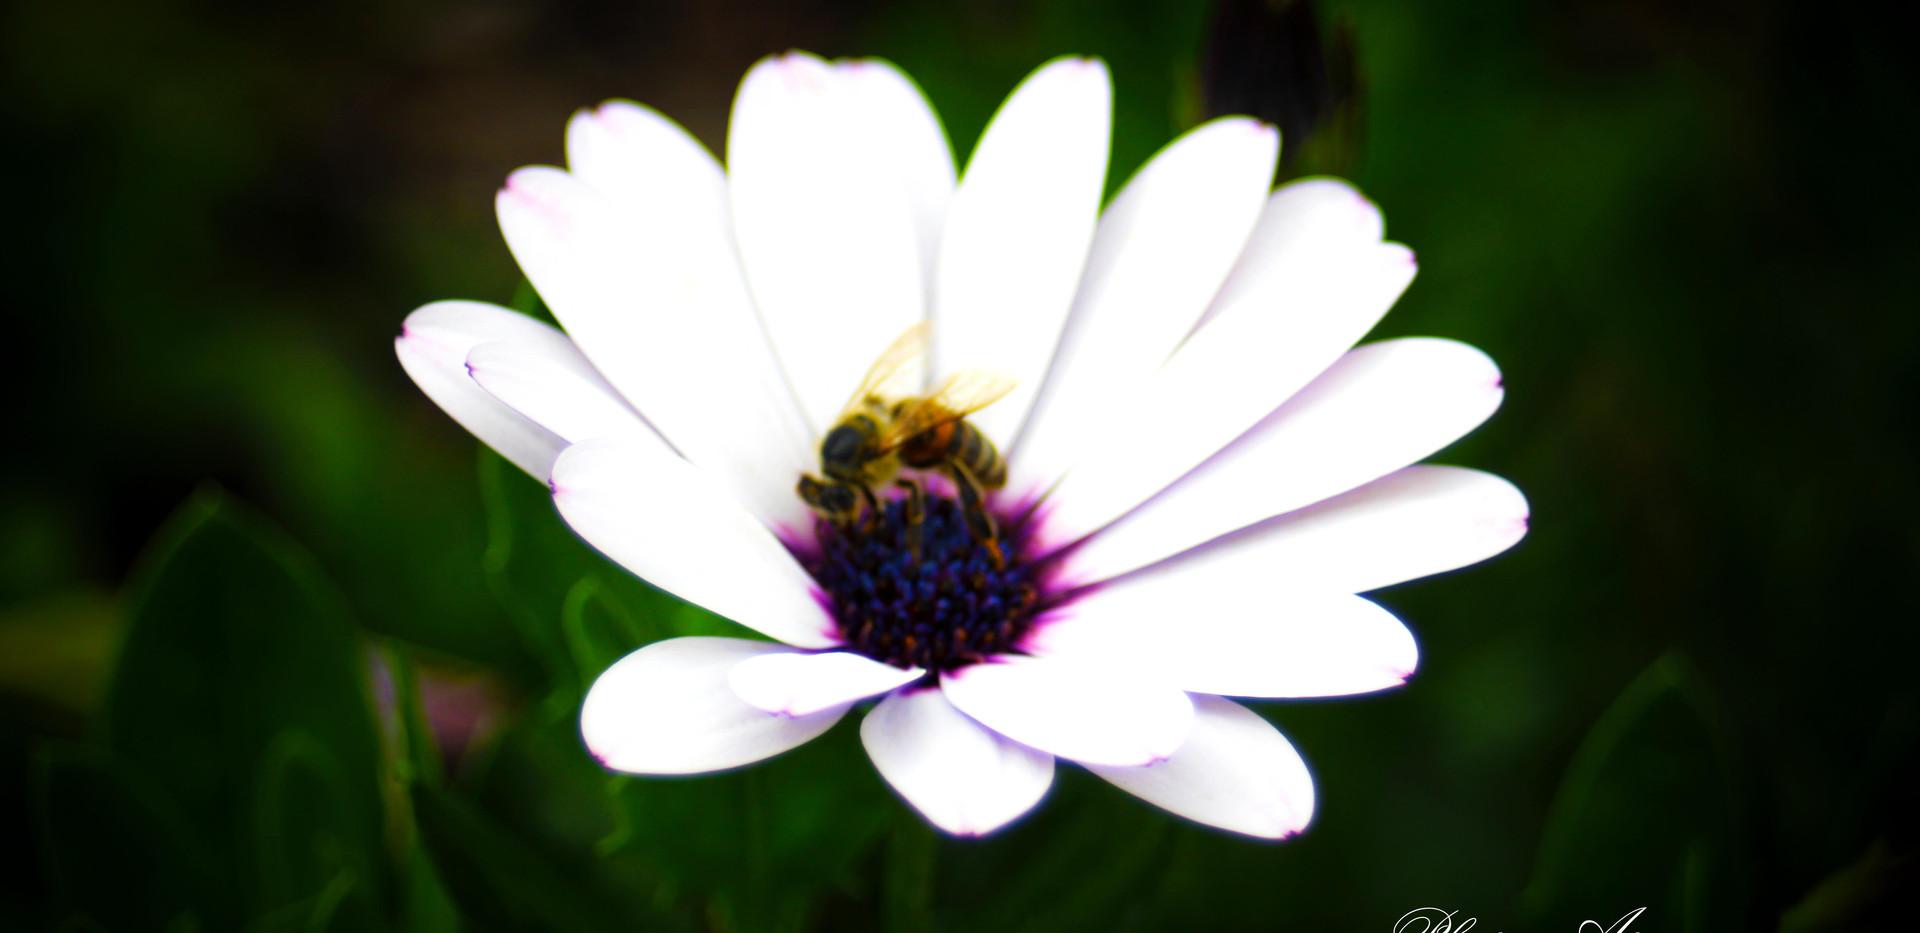 White Osteospermum Daisy and Bee